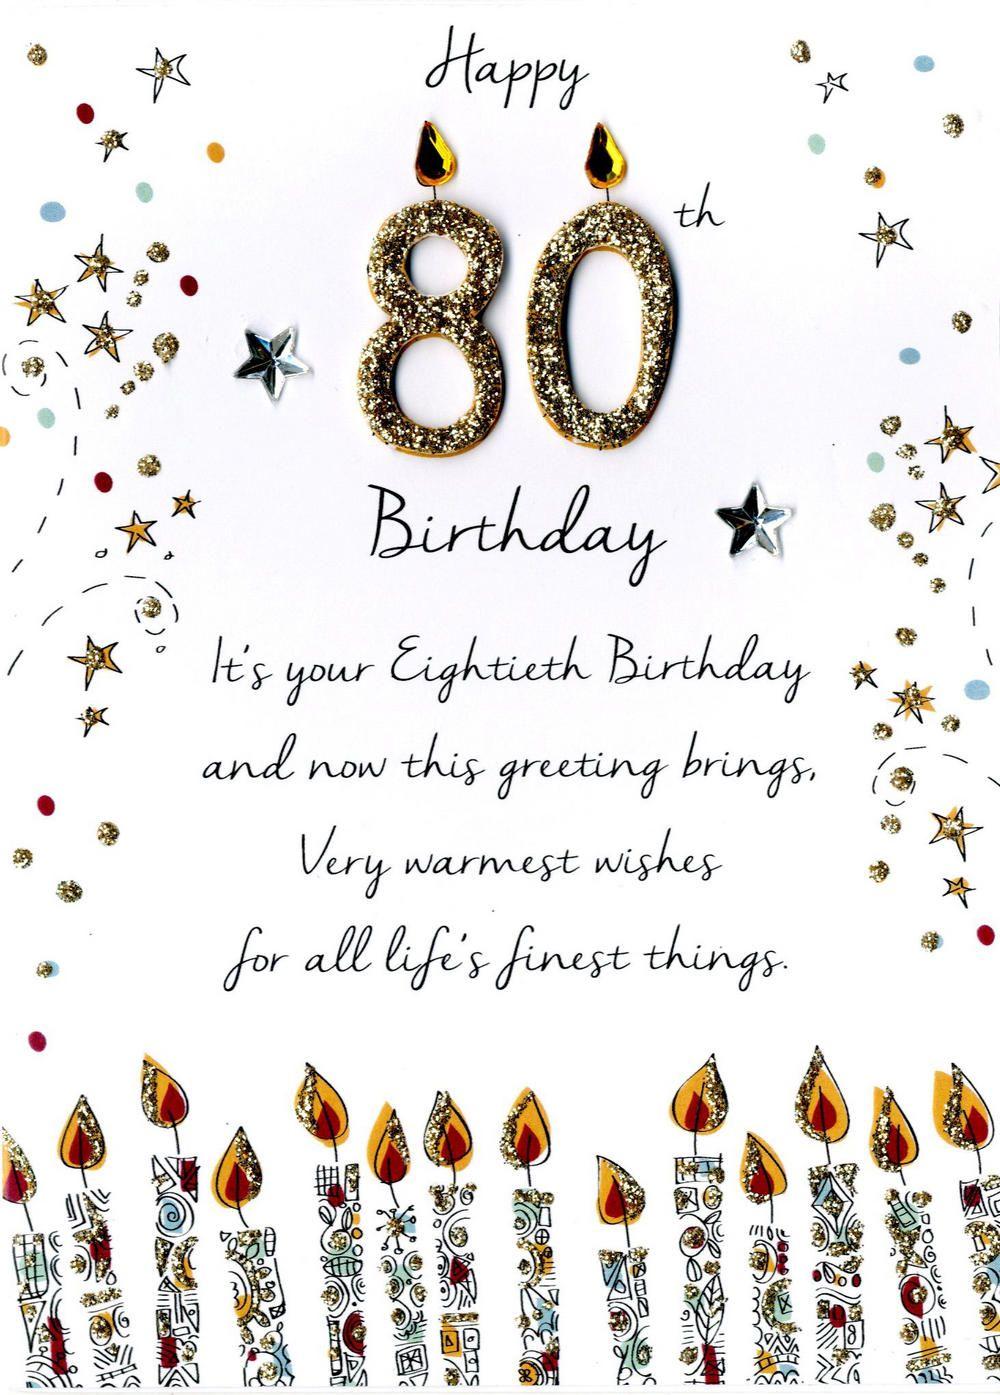 80th Birthday Greetings Images : birthday, greetings, images, Birthday, Greeting, Cards, Kates, Cards,, Greetings, Verses